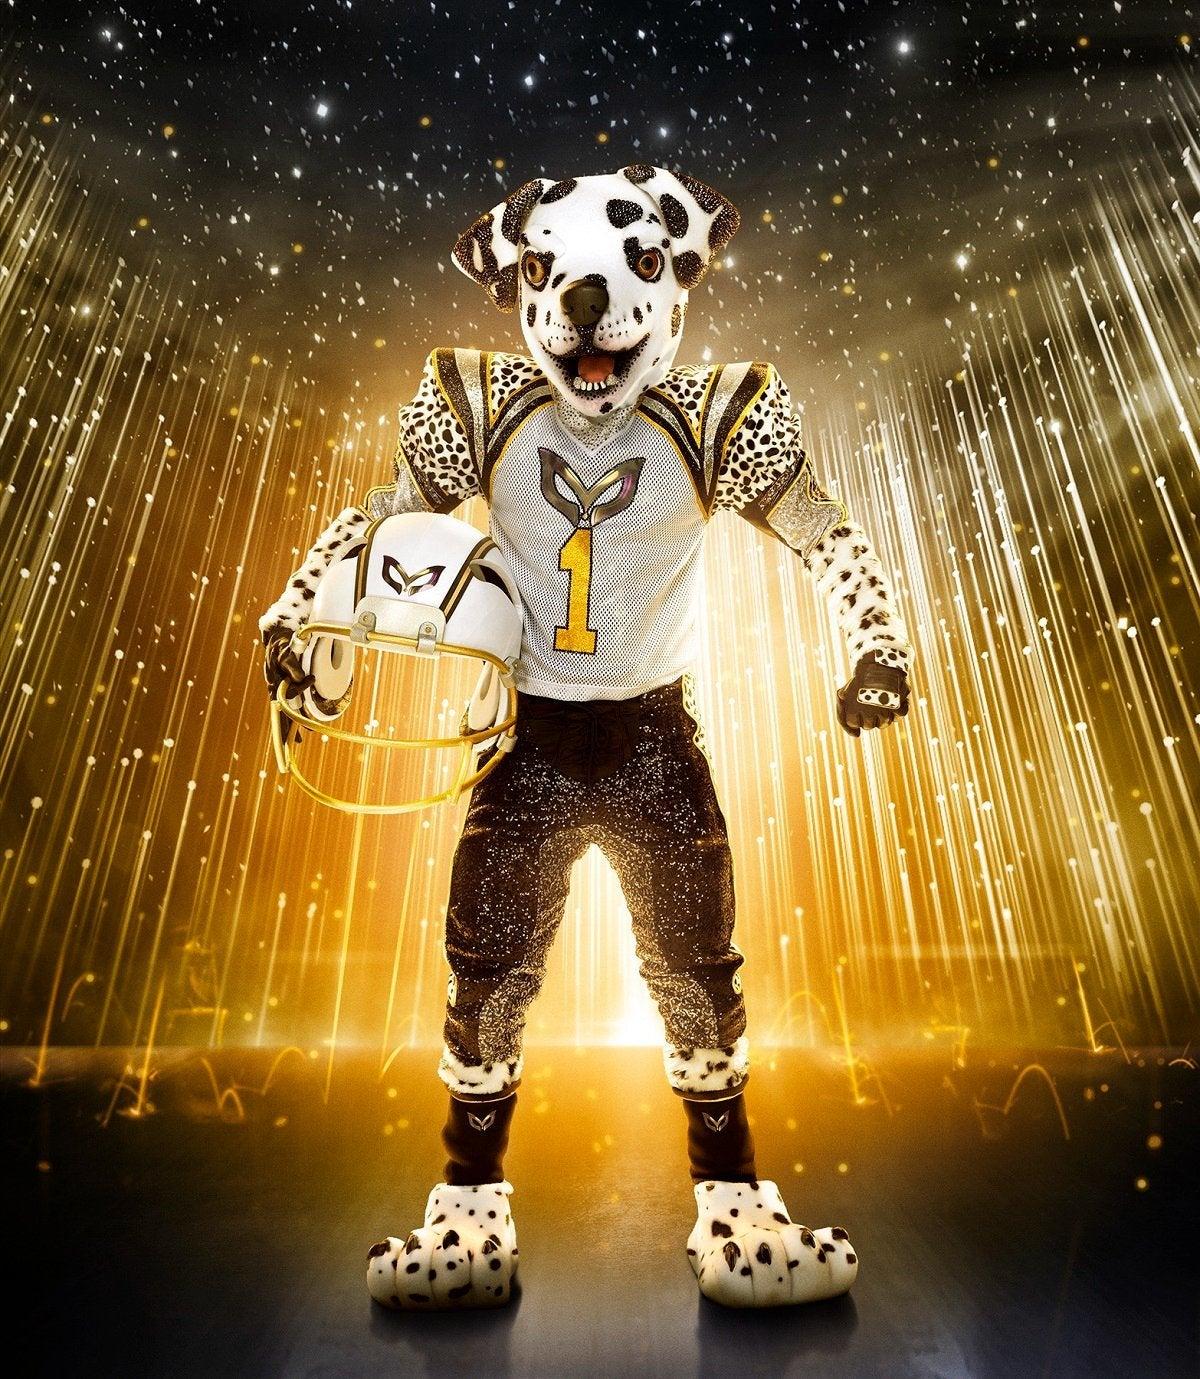 masked-singer-season-6-dalmatian-fox